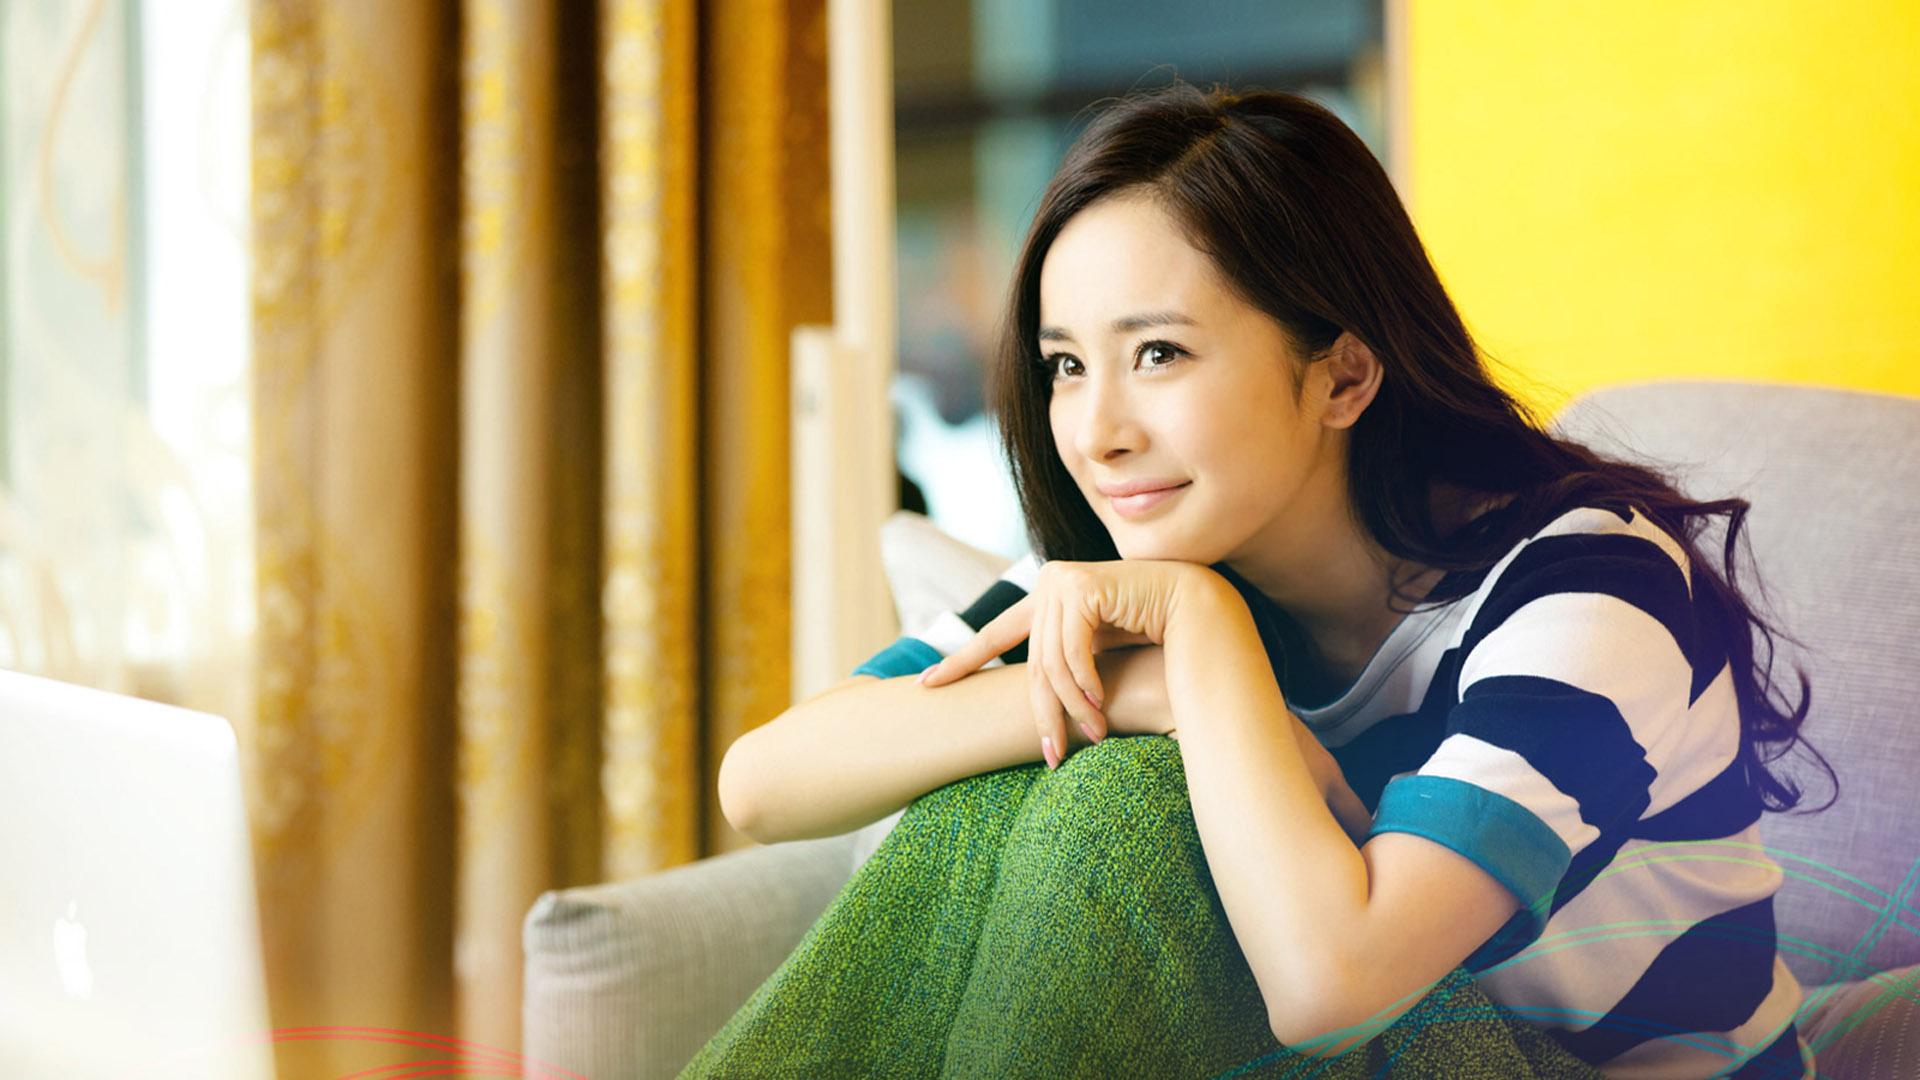 People 1920x1080 Asian Chinese women smiling yang mi